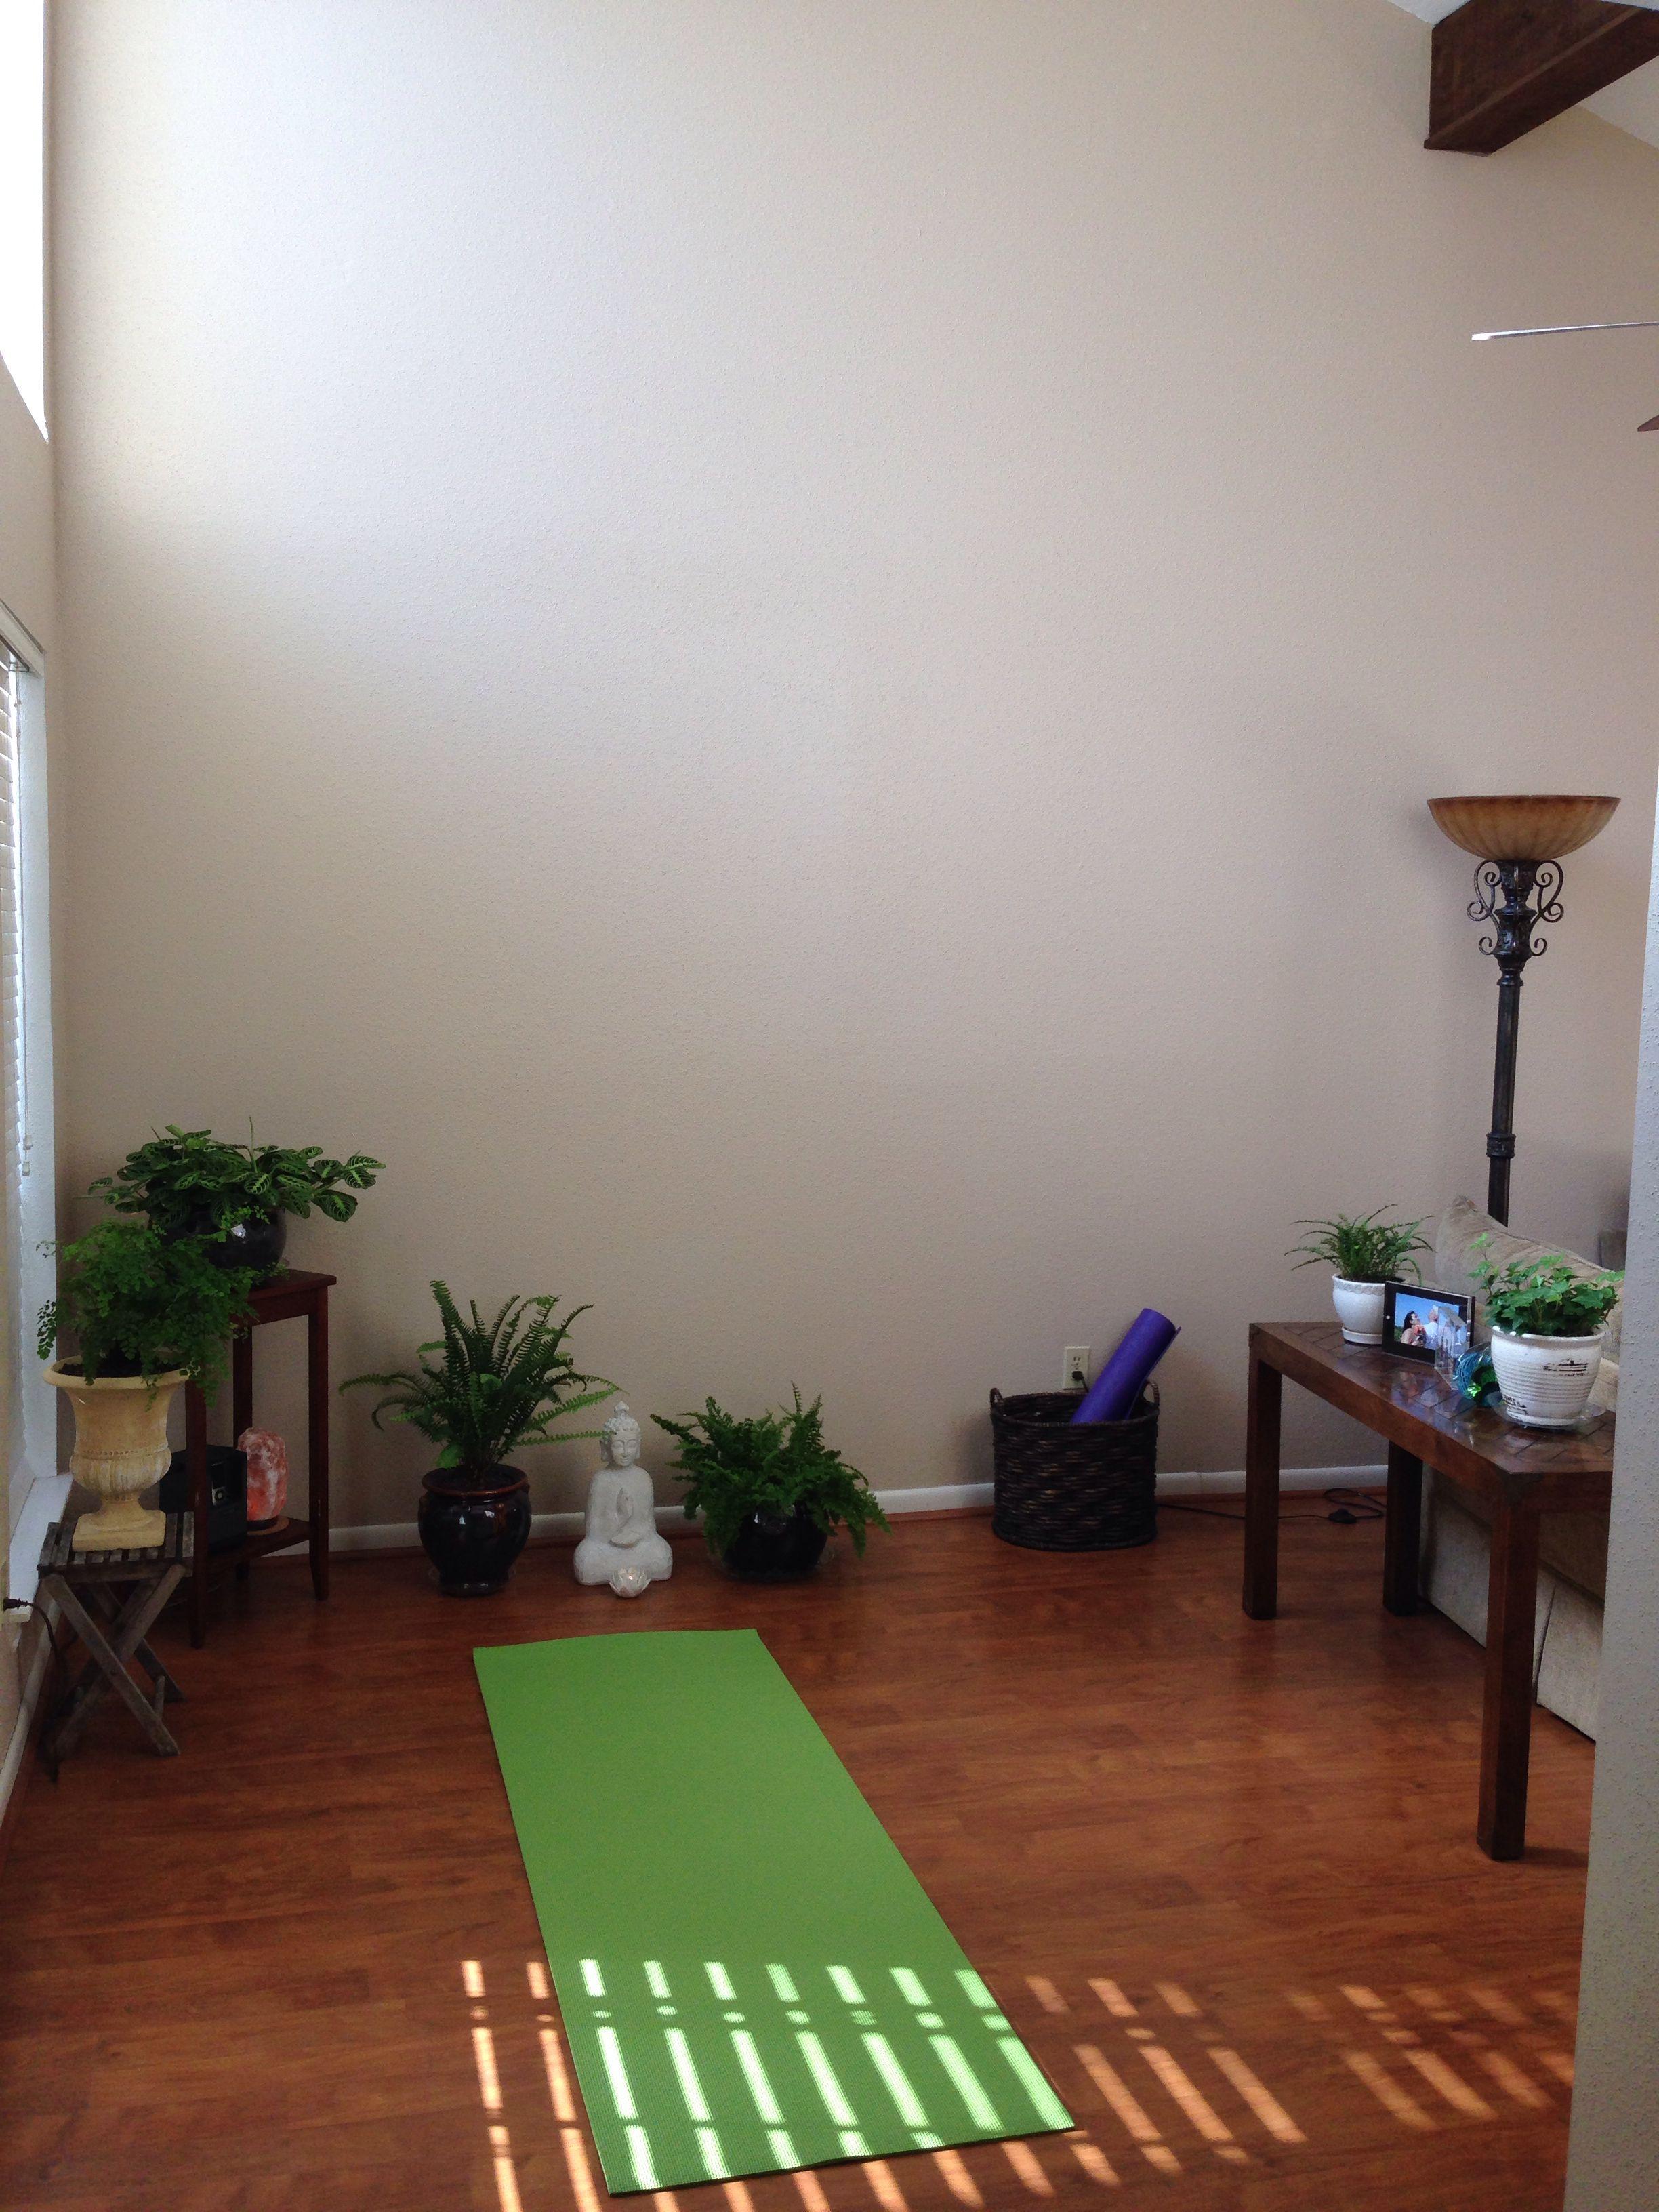 My Home Yoga Space